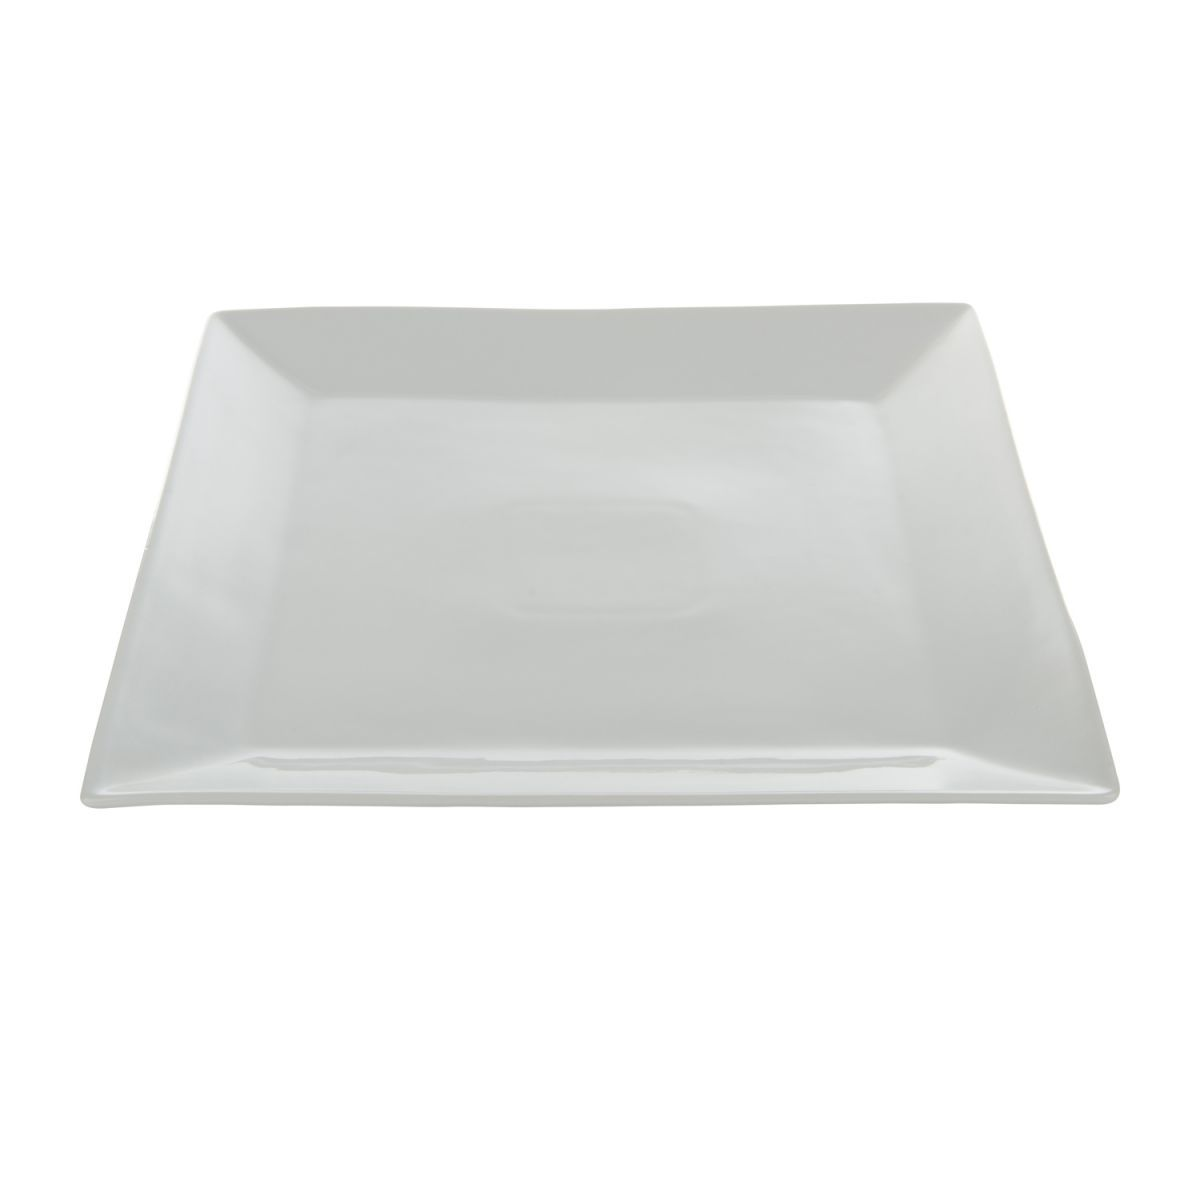 bord vierkant 31x31cmbox 4